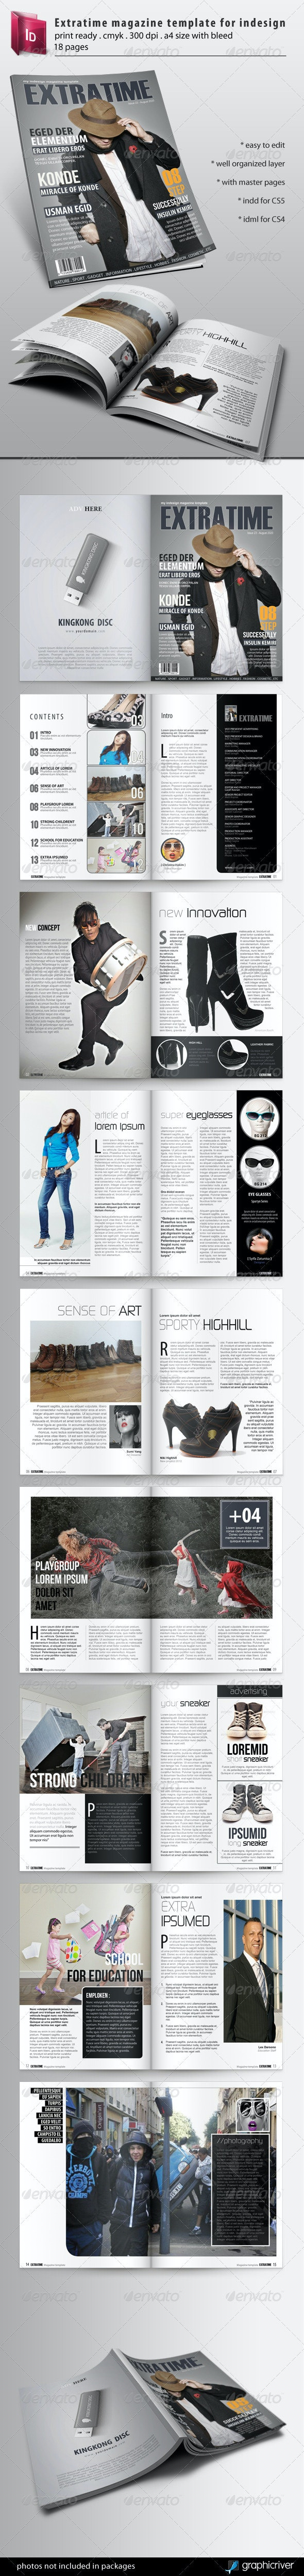 Extratime Magazine Template - Magazines Print Templates